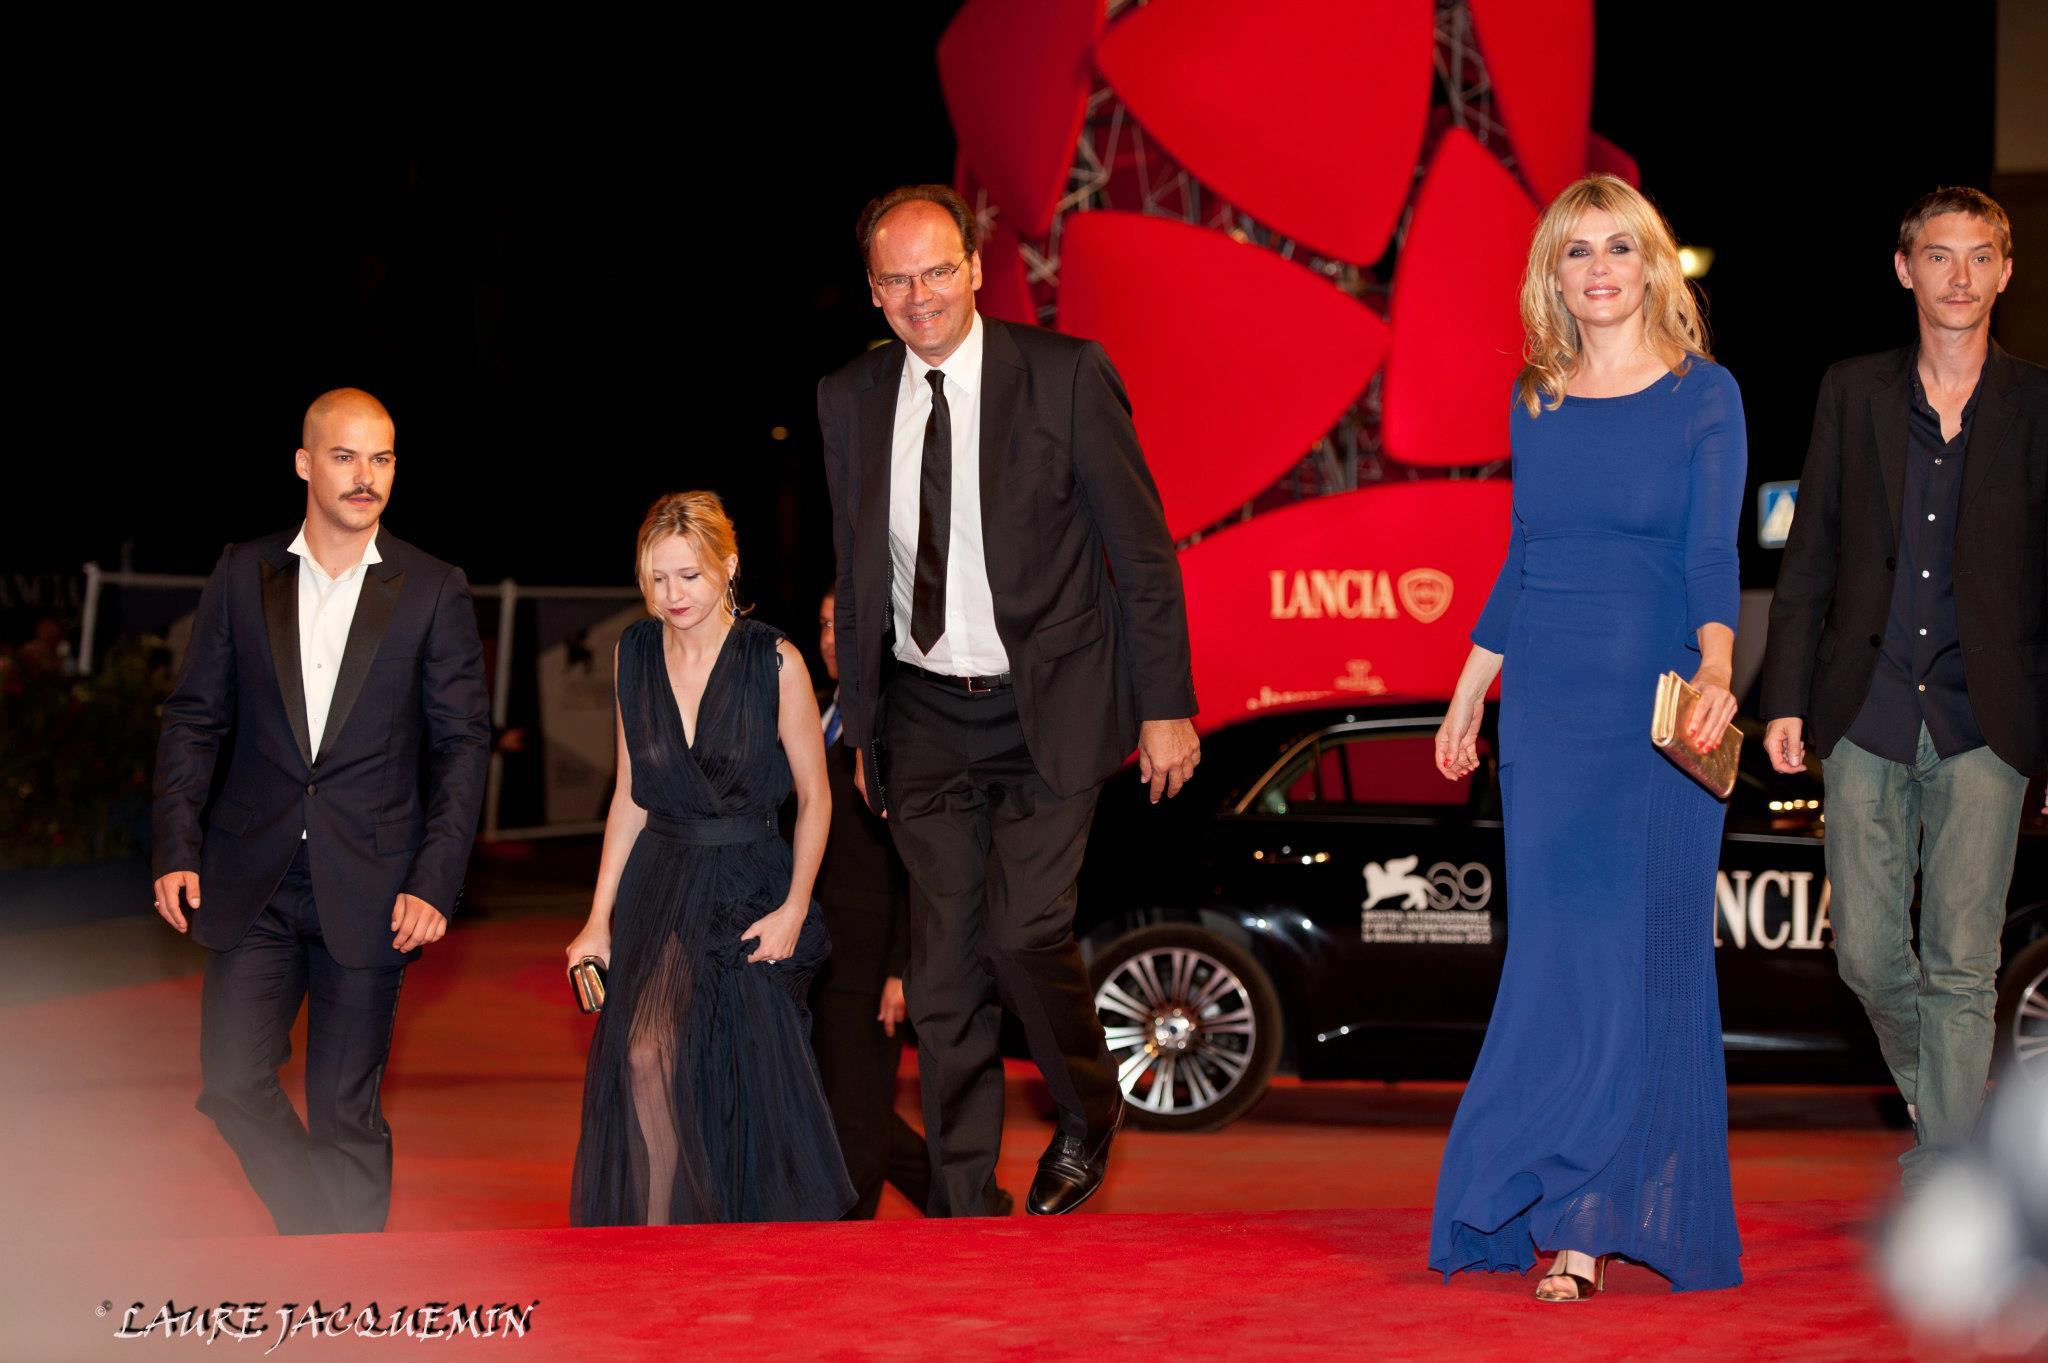 venice film festival venice laure jacquemin (69).jpg